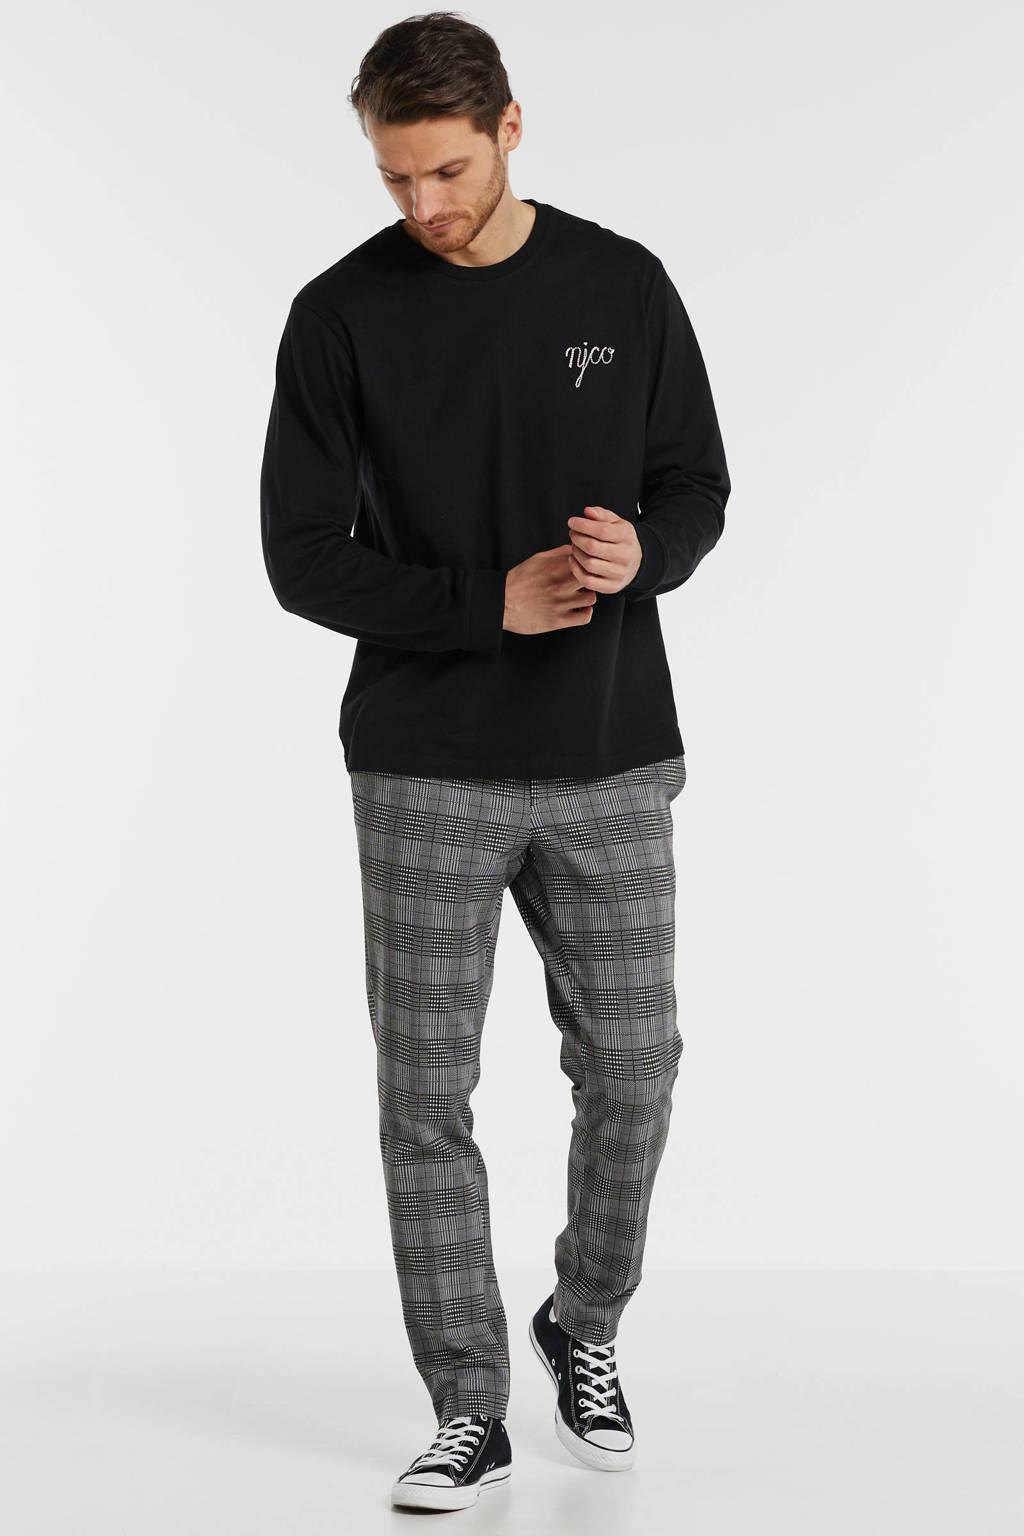 Nudie Jeans T-shirt met printopdruk zwart, Zwart